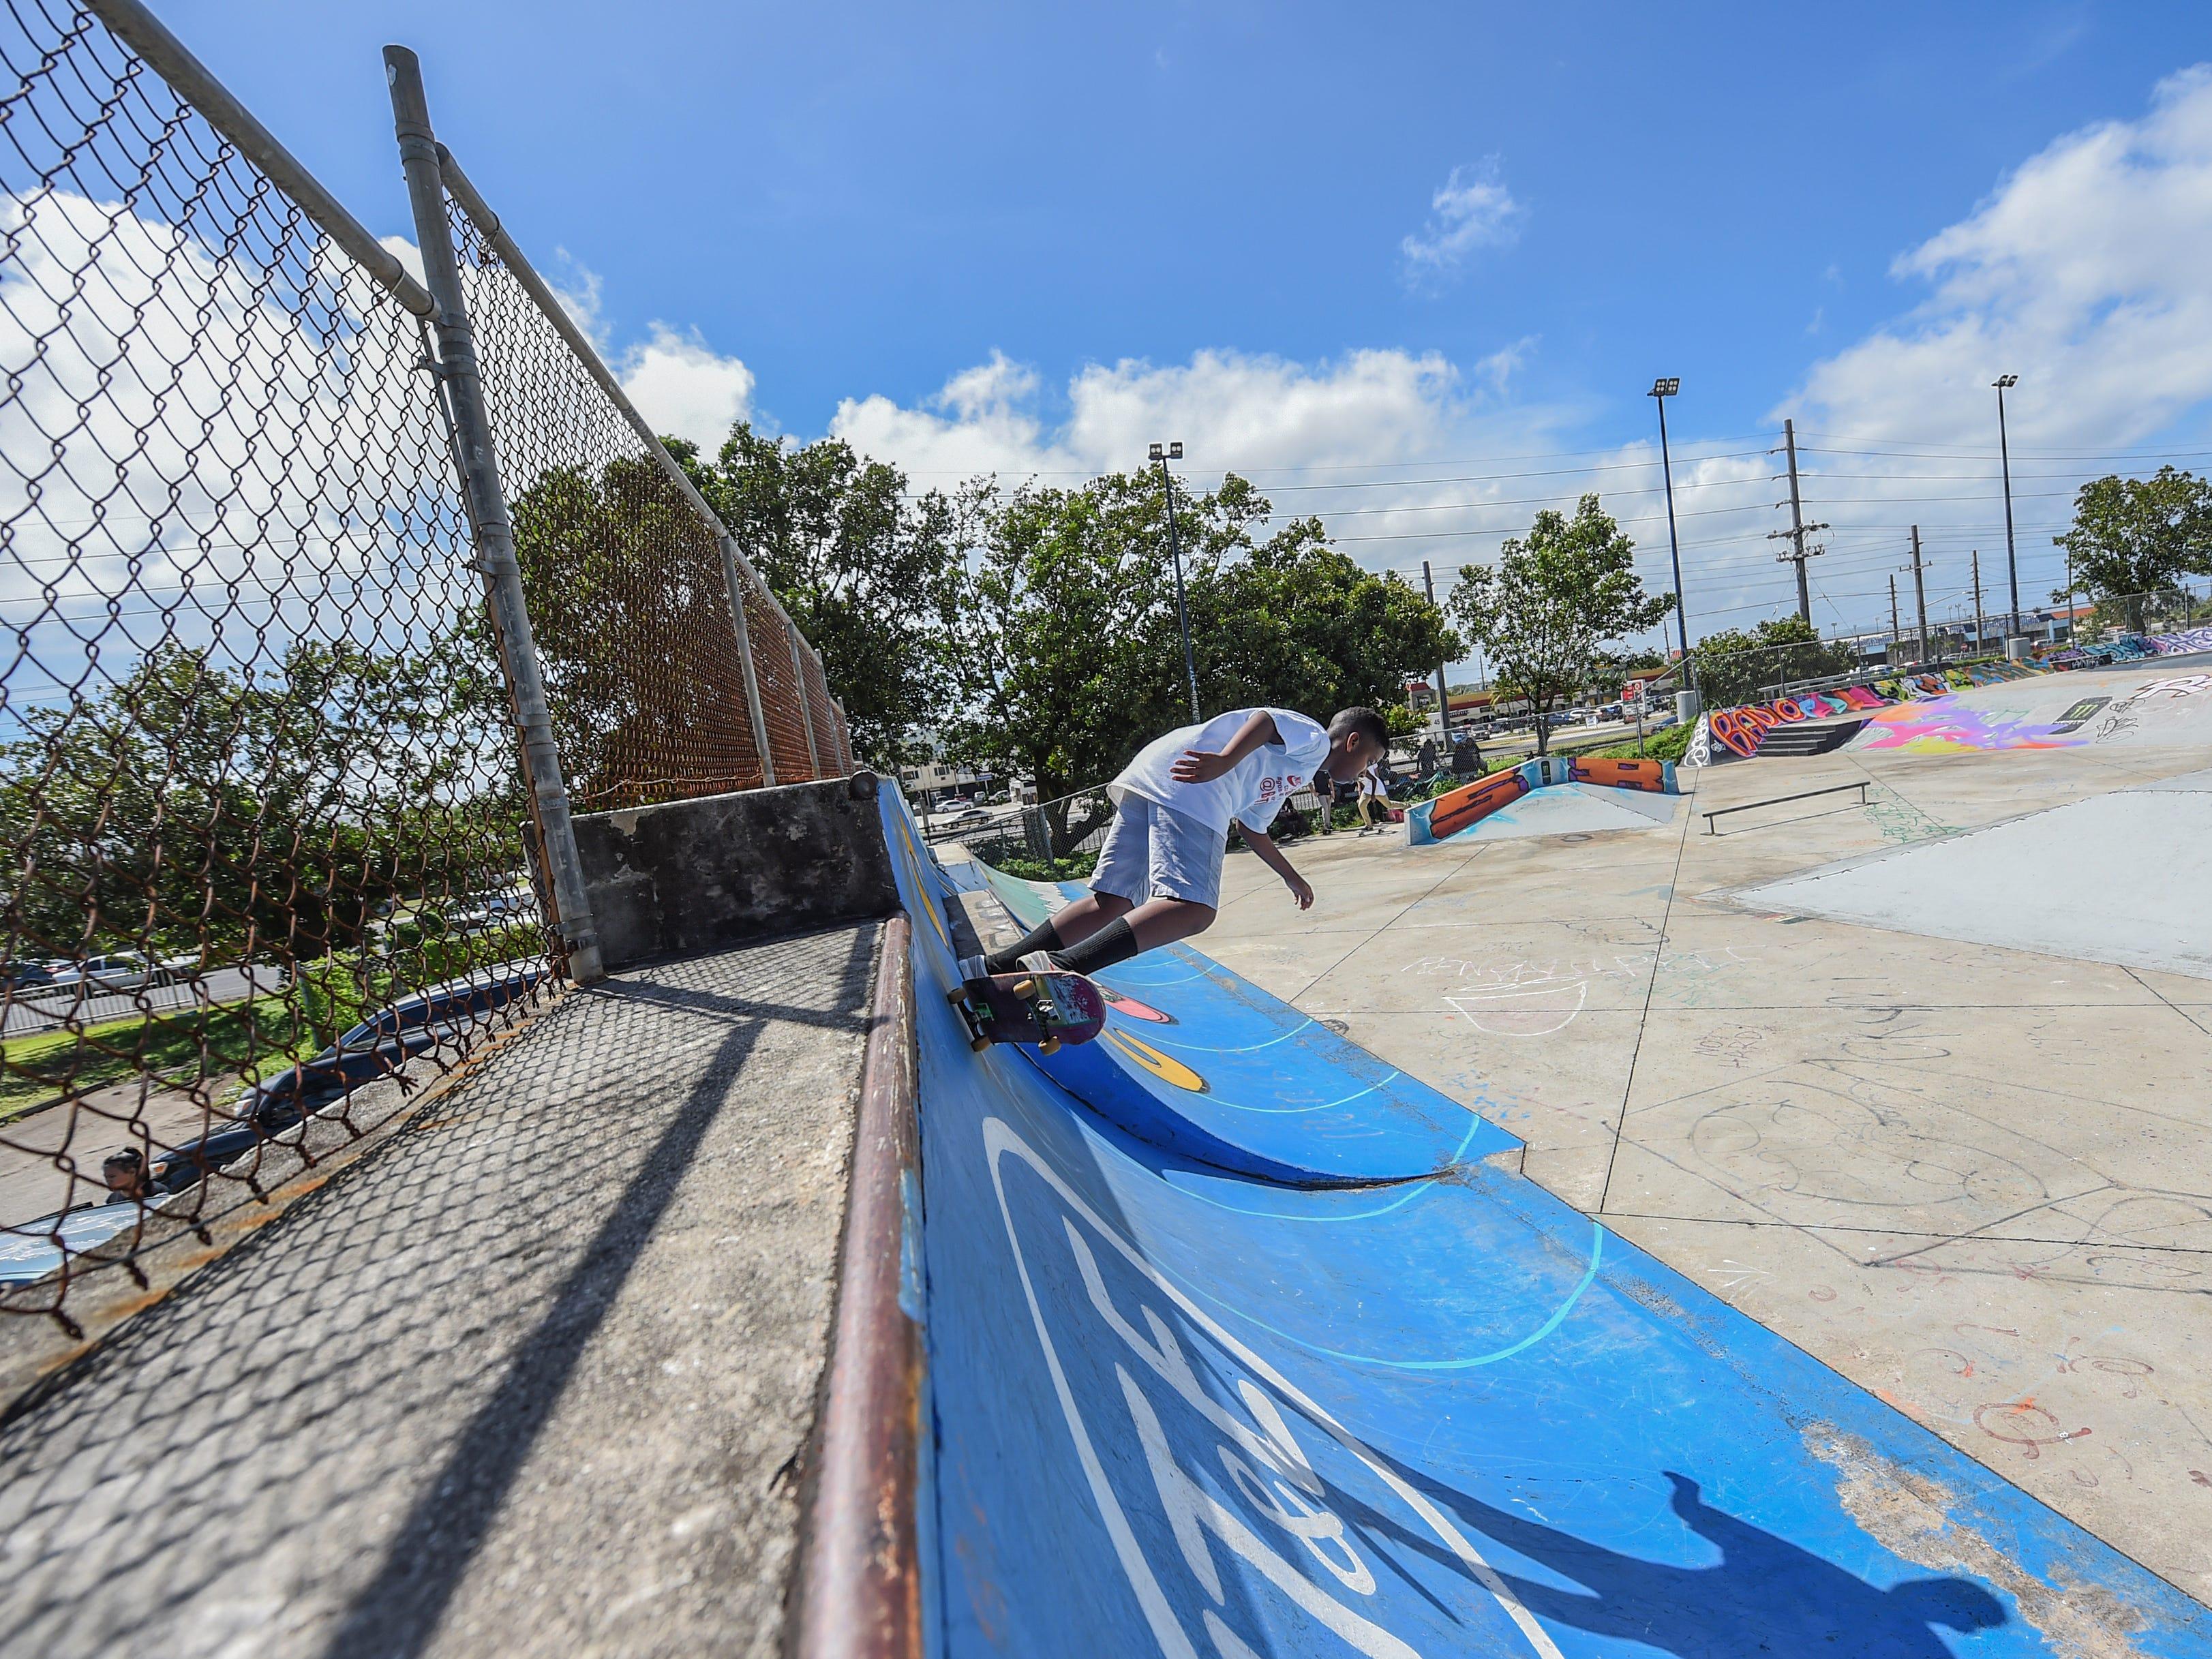 Dakarai Nelson shows off some tricks at the Dededo Skatepark on Feb. 3, 2019.